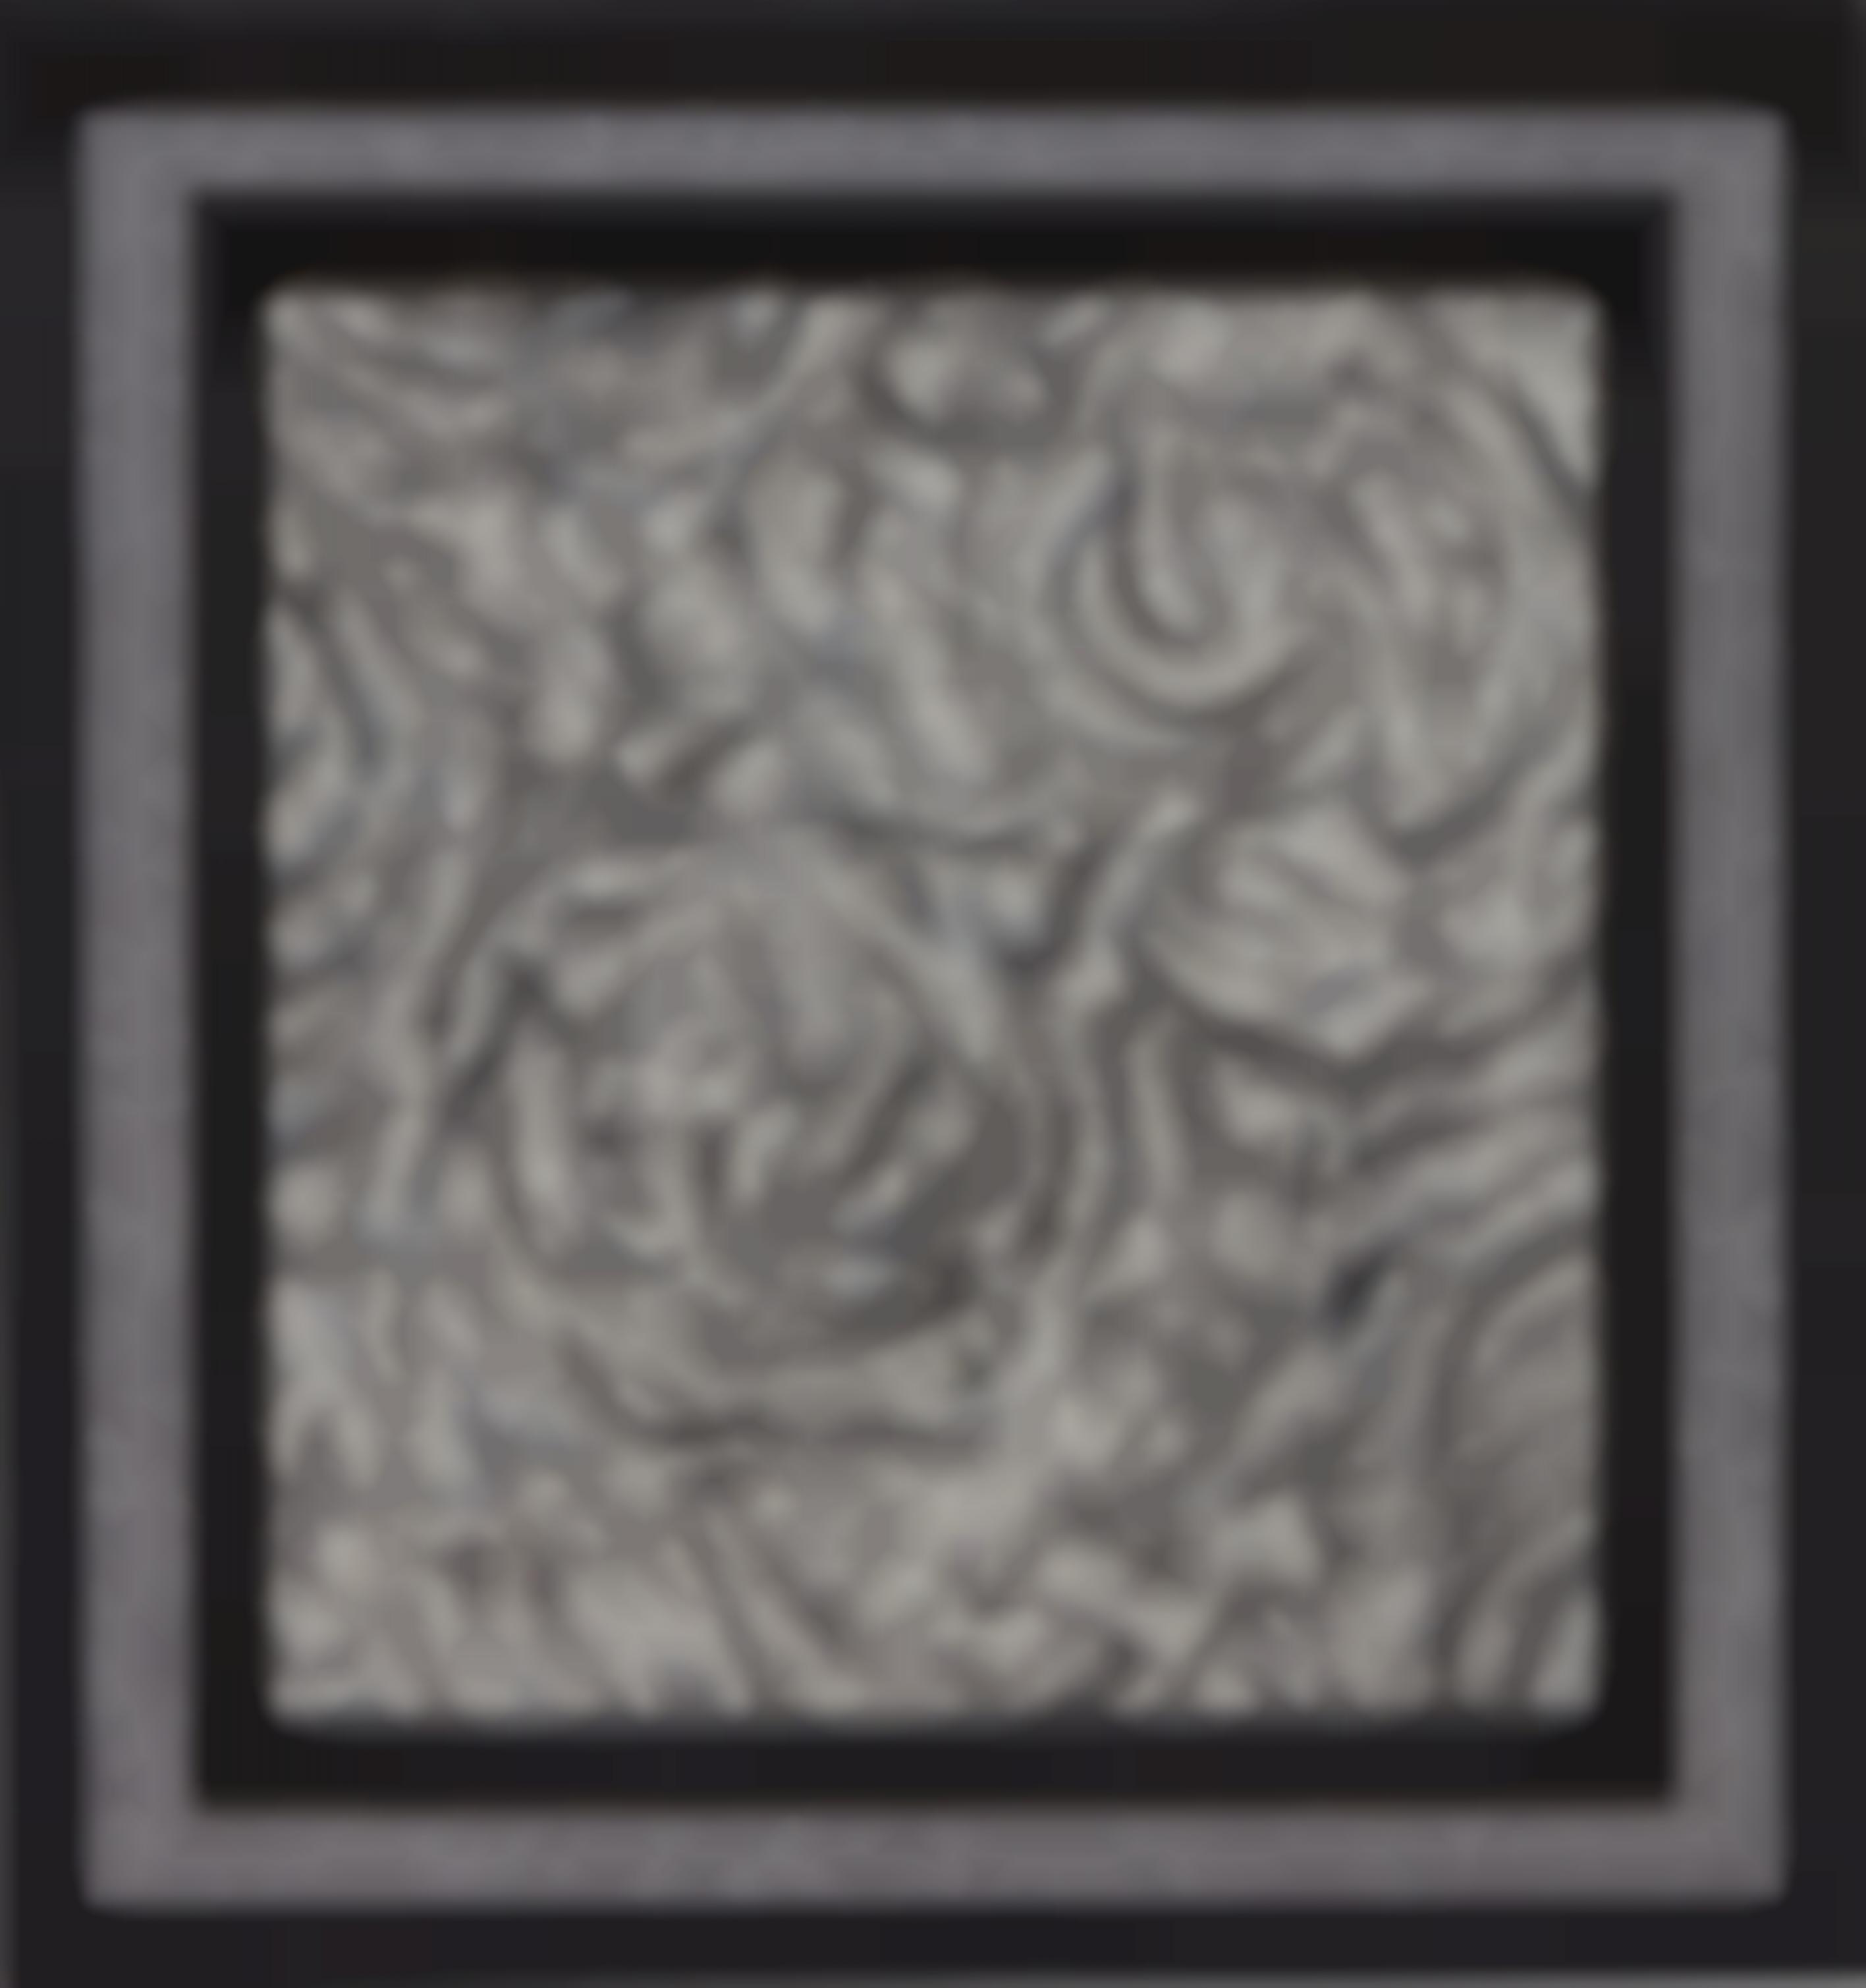 Richard Artschwager-Weave/Weave-1991